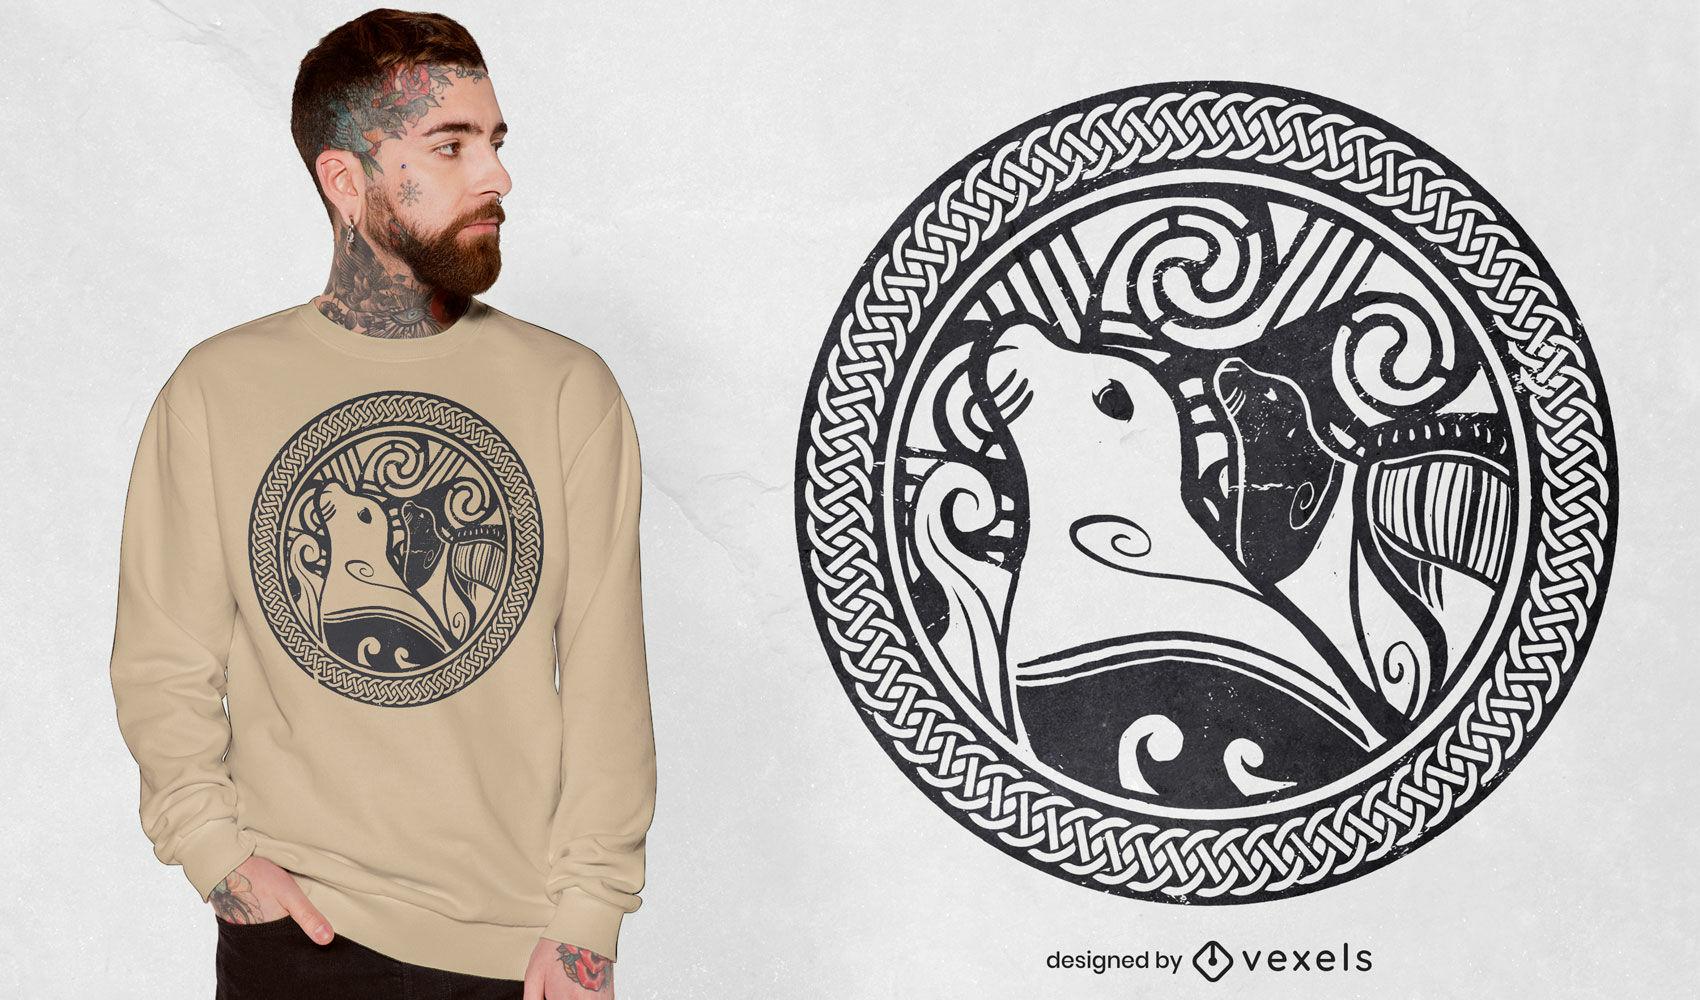 Seal celtic knot t-shirt design